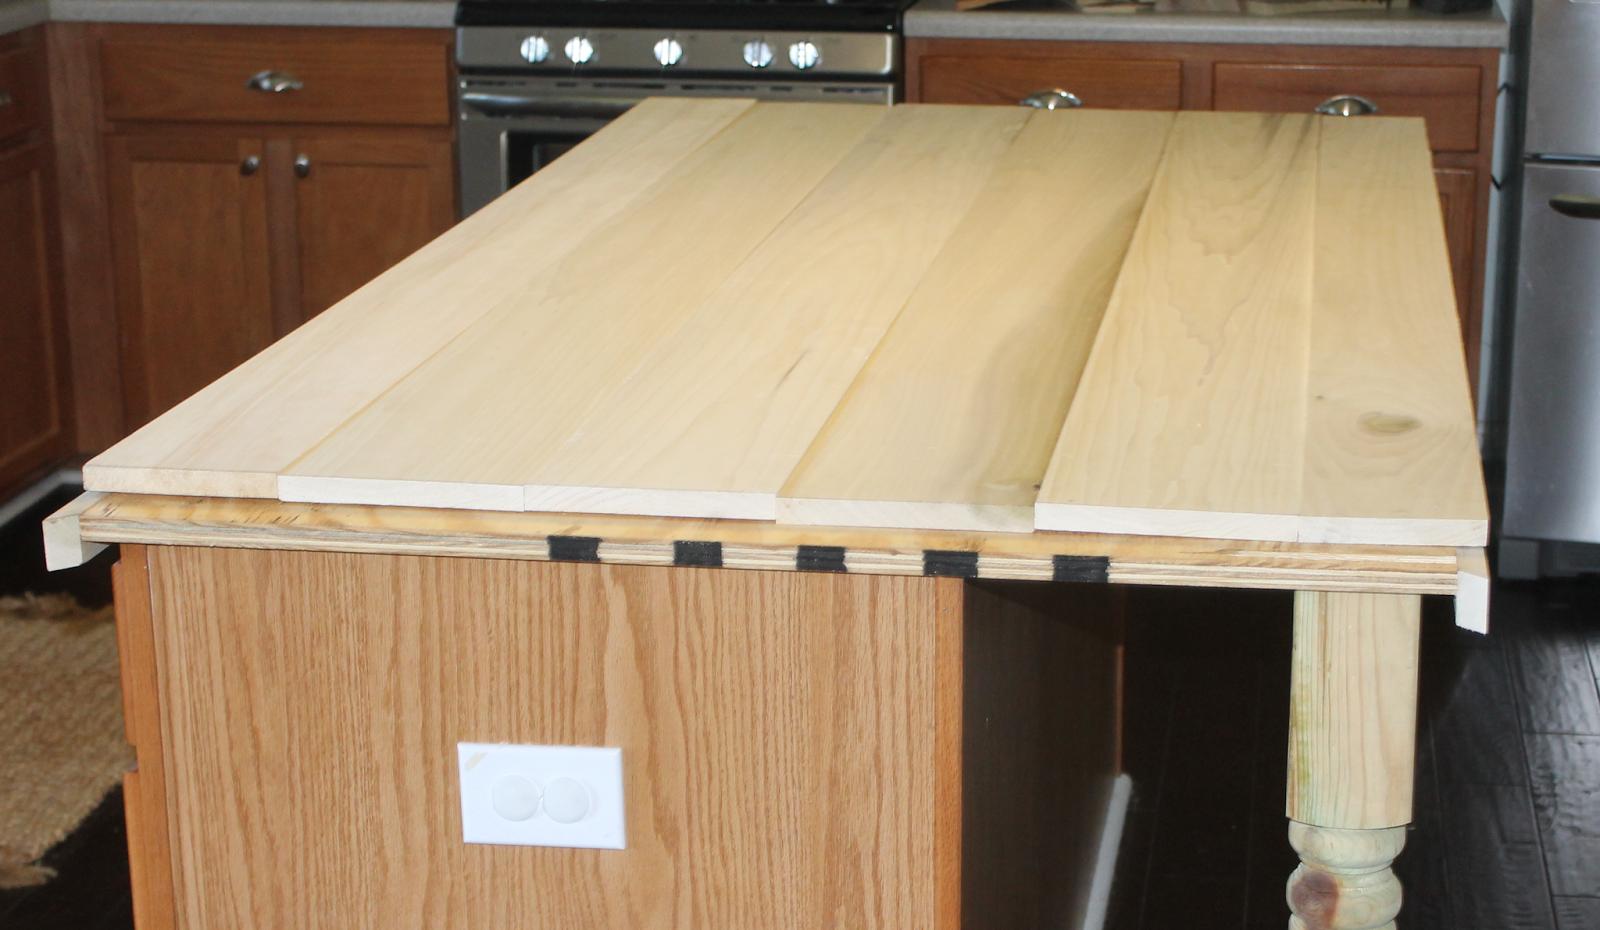 Granite Countertop Plywood ~ Do i need plywood under granite countertop installed